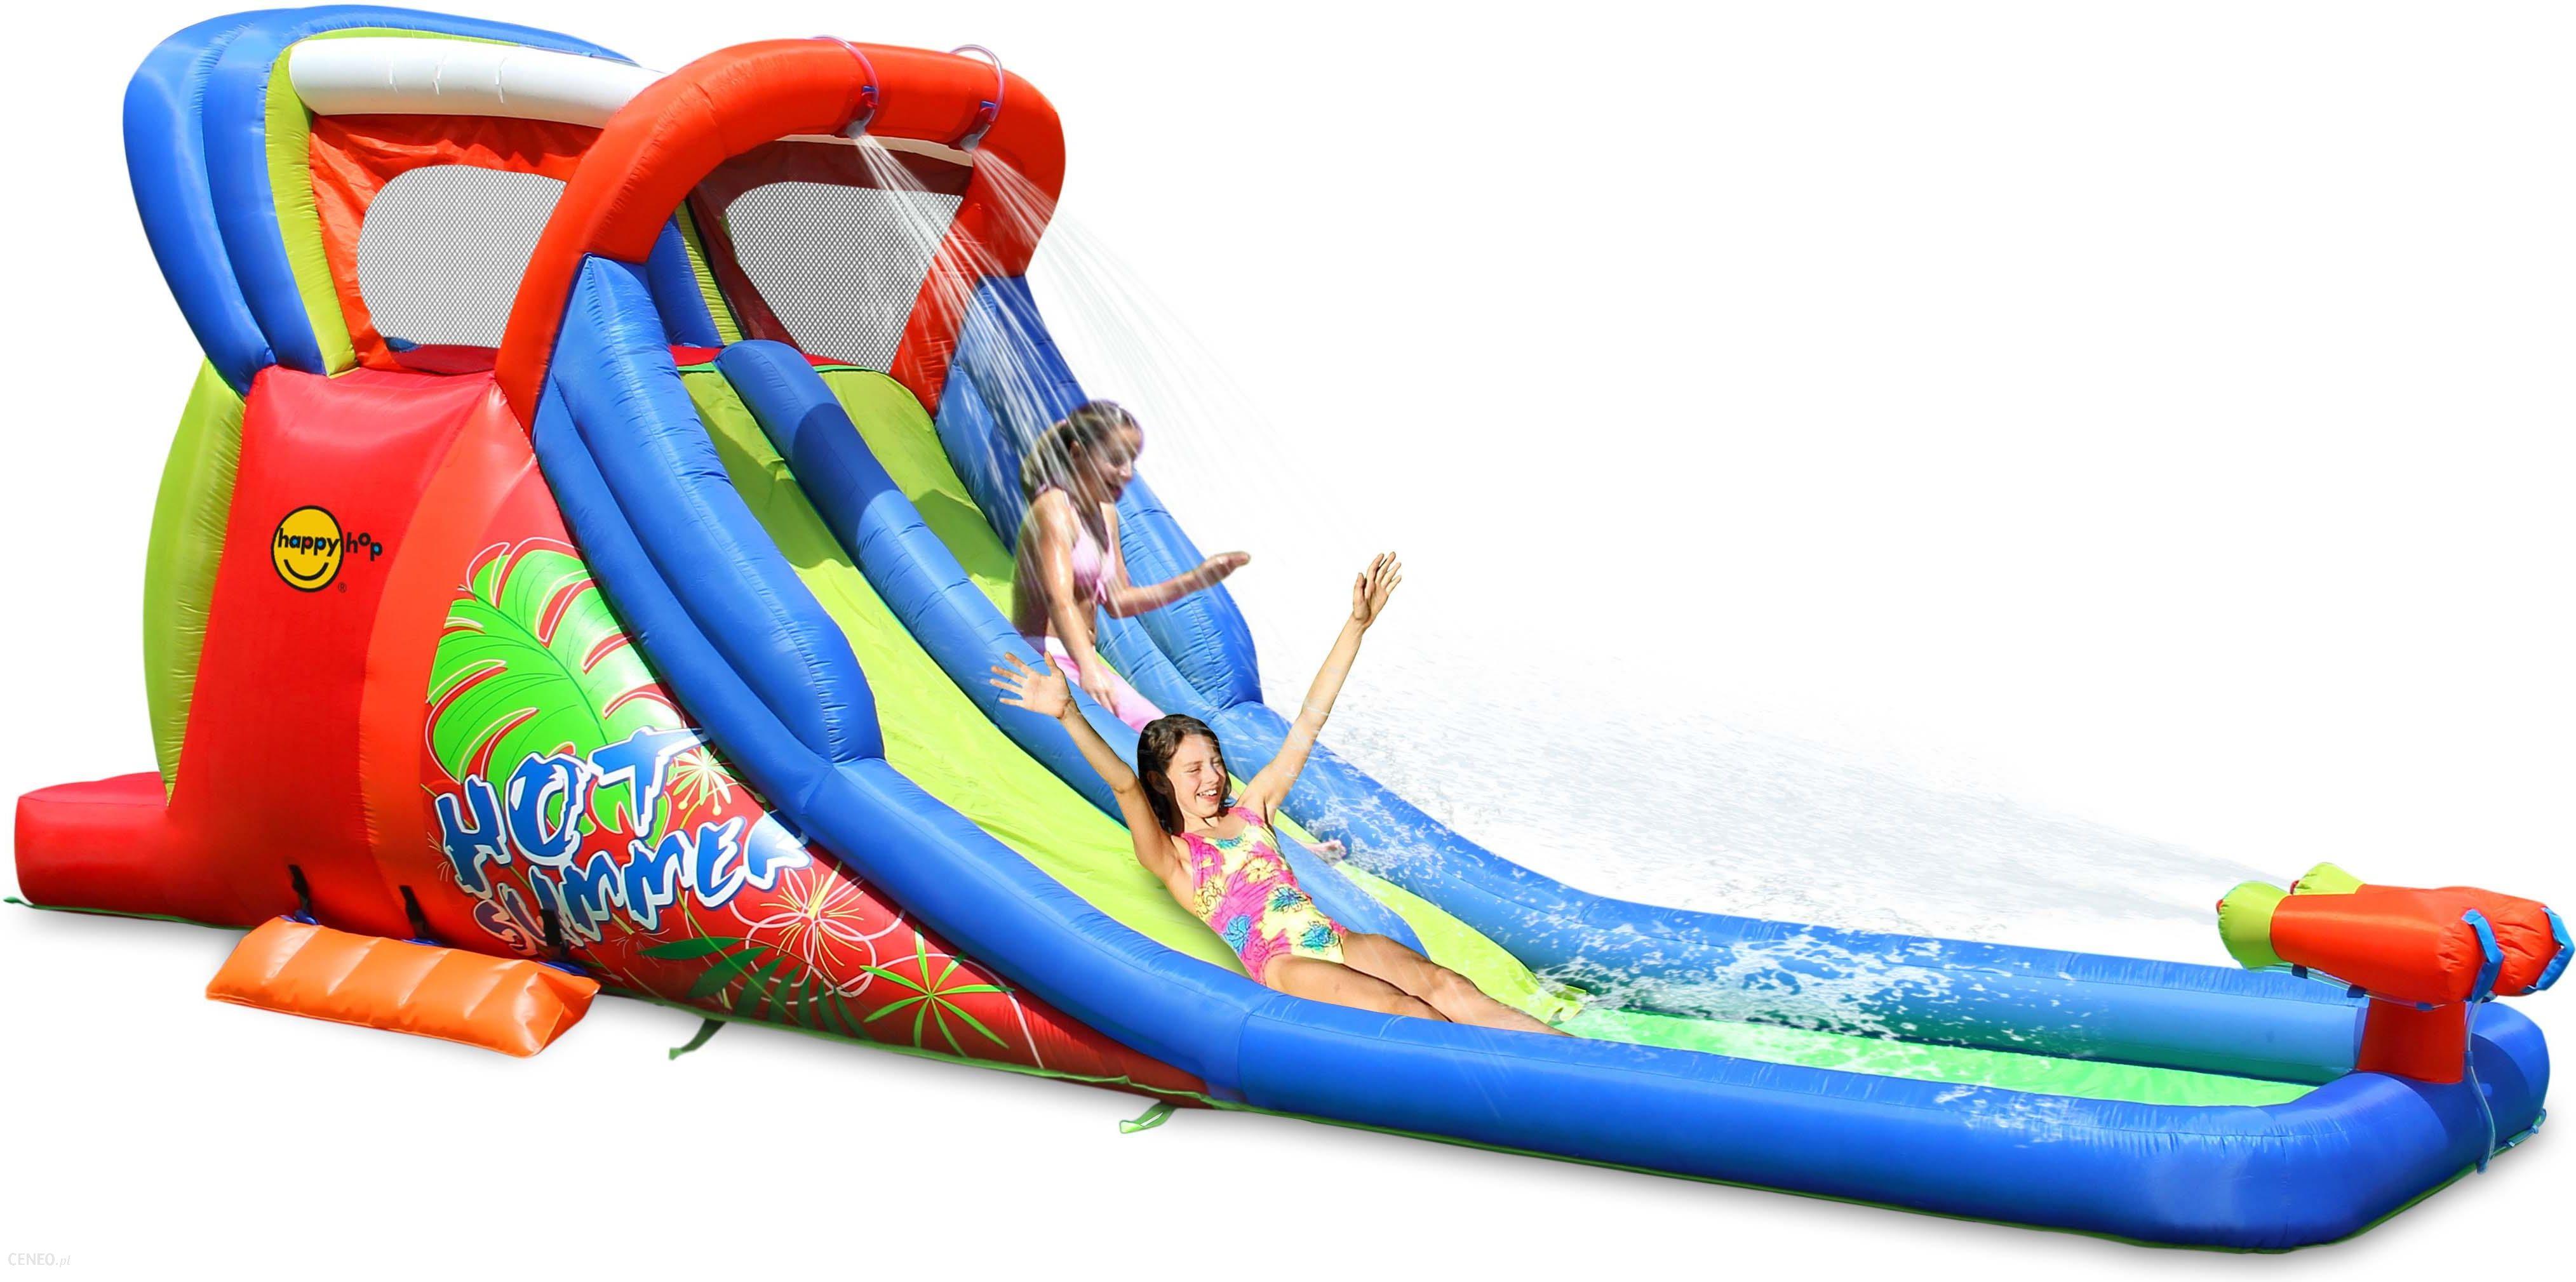 Super Happyhop Dmuchana Zjeżdżalnia Wodna Hot Summer (D9129) - Ceny i AN21